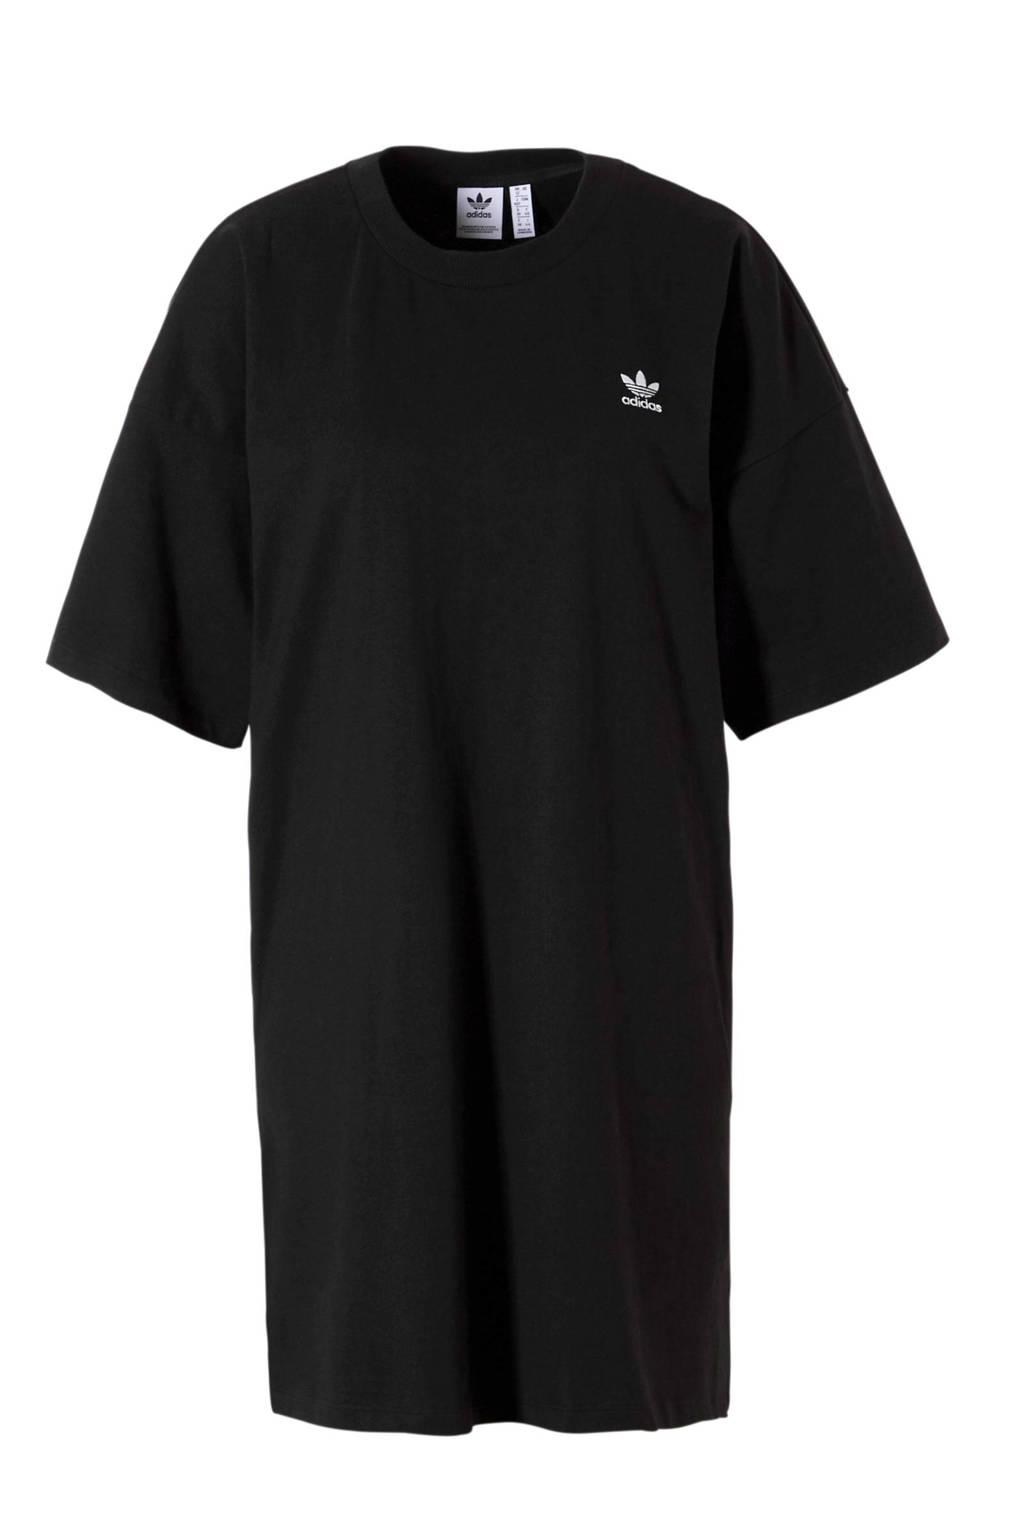 Adidas Zwart Zwart Adidas Adidas Sweatjurk Adidas Originals Originals Originals Zwart Sweatjurk Sweatjurk Originals rFRq75wr